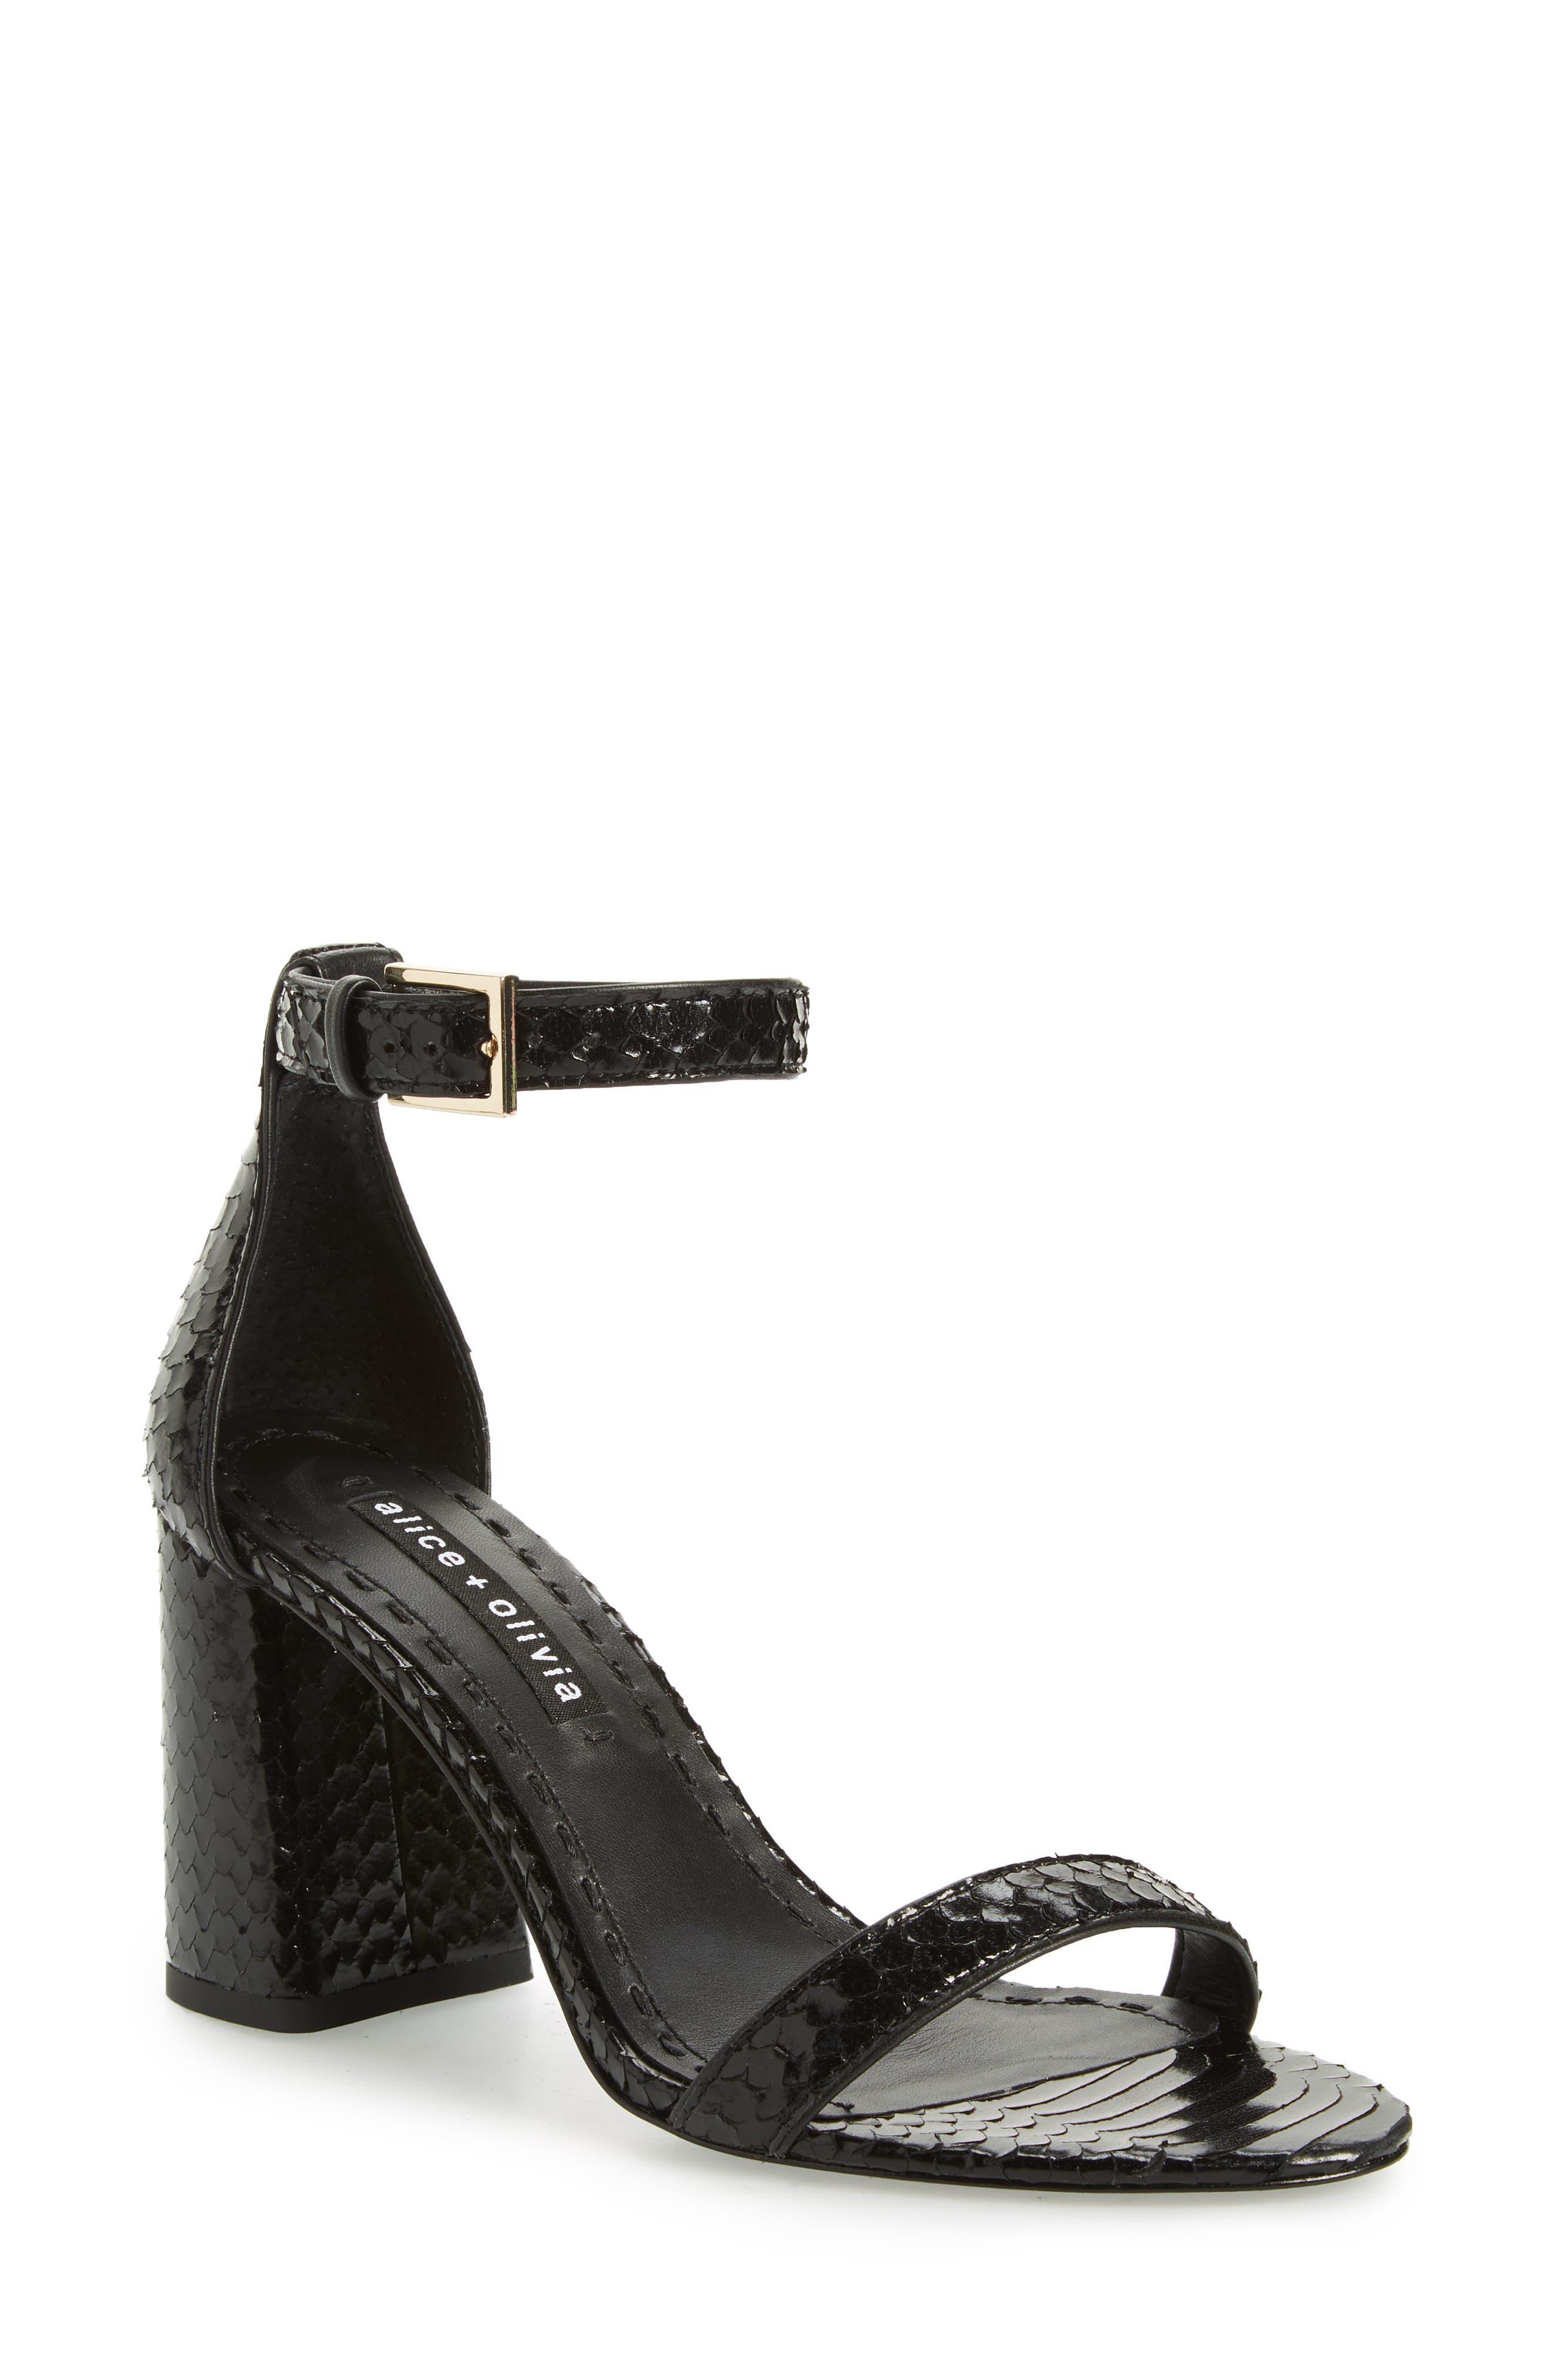 Lillian Ankle Strap Sandal,                         Main,                         color, Black